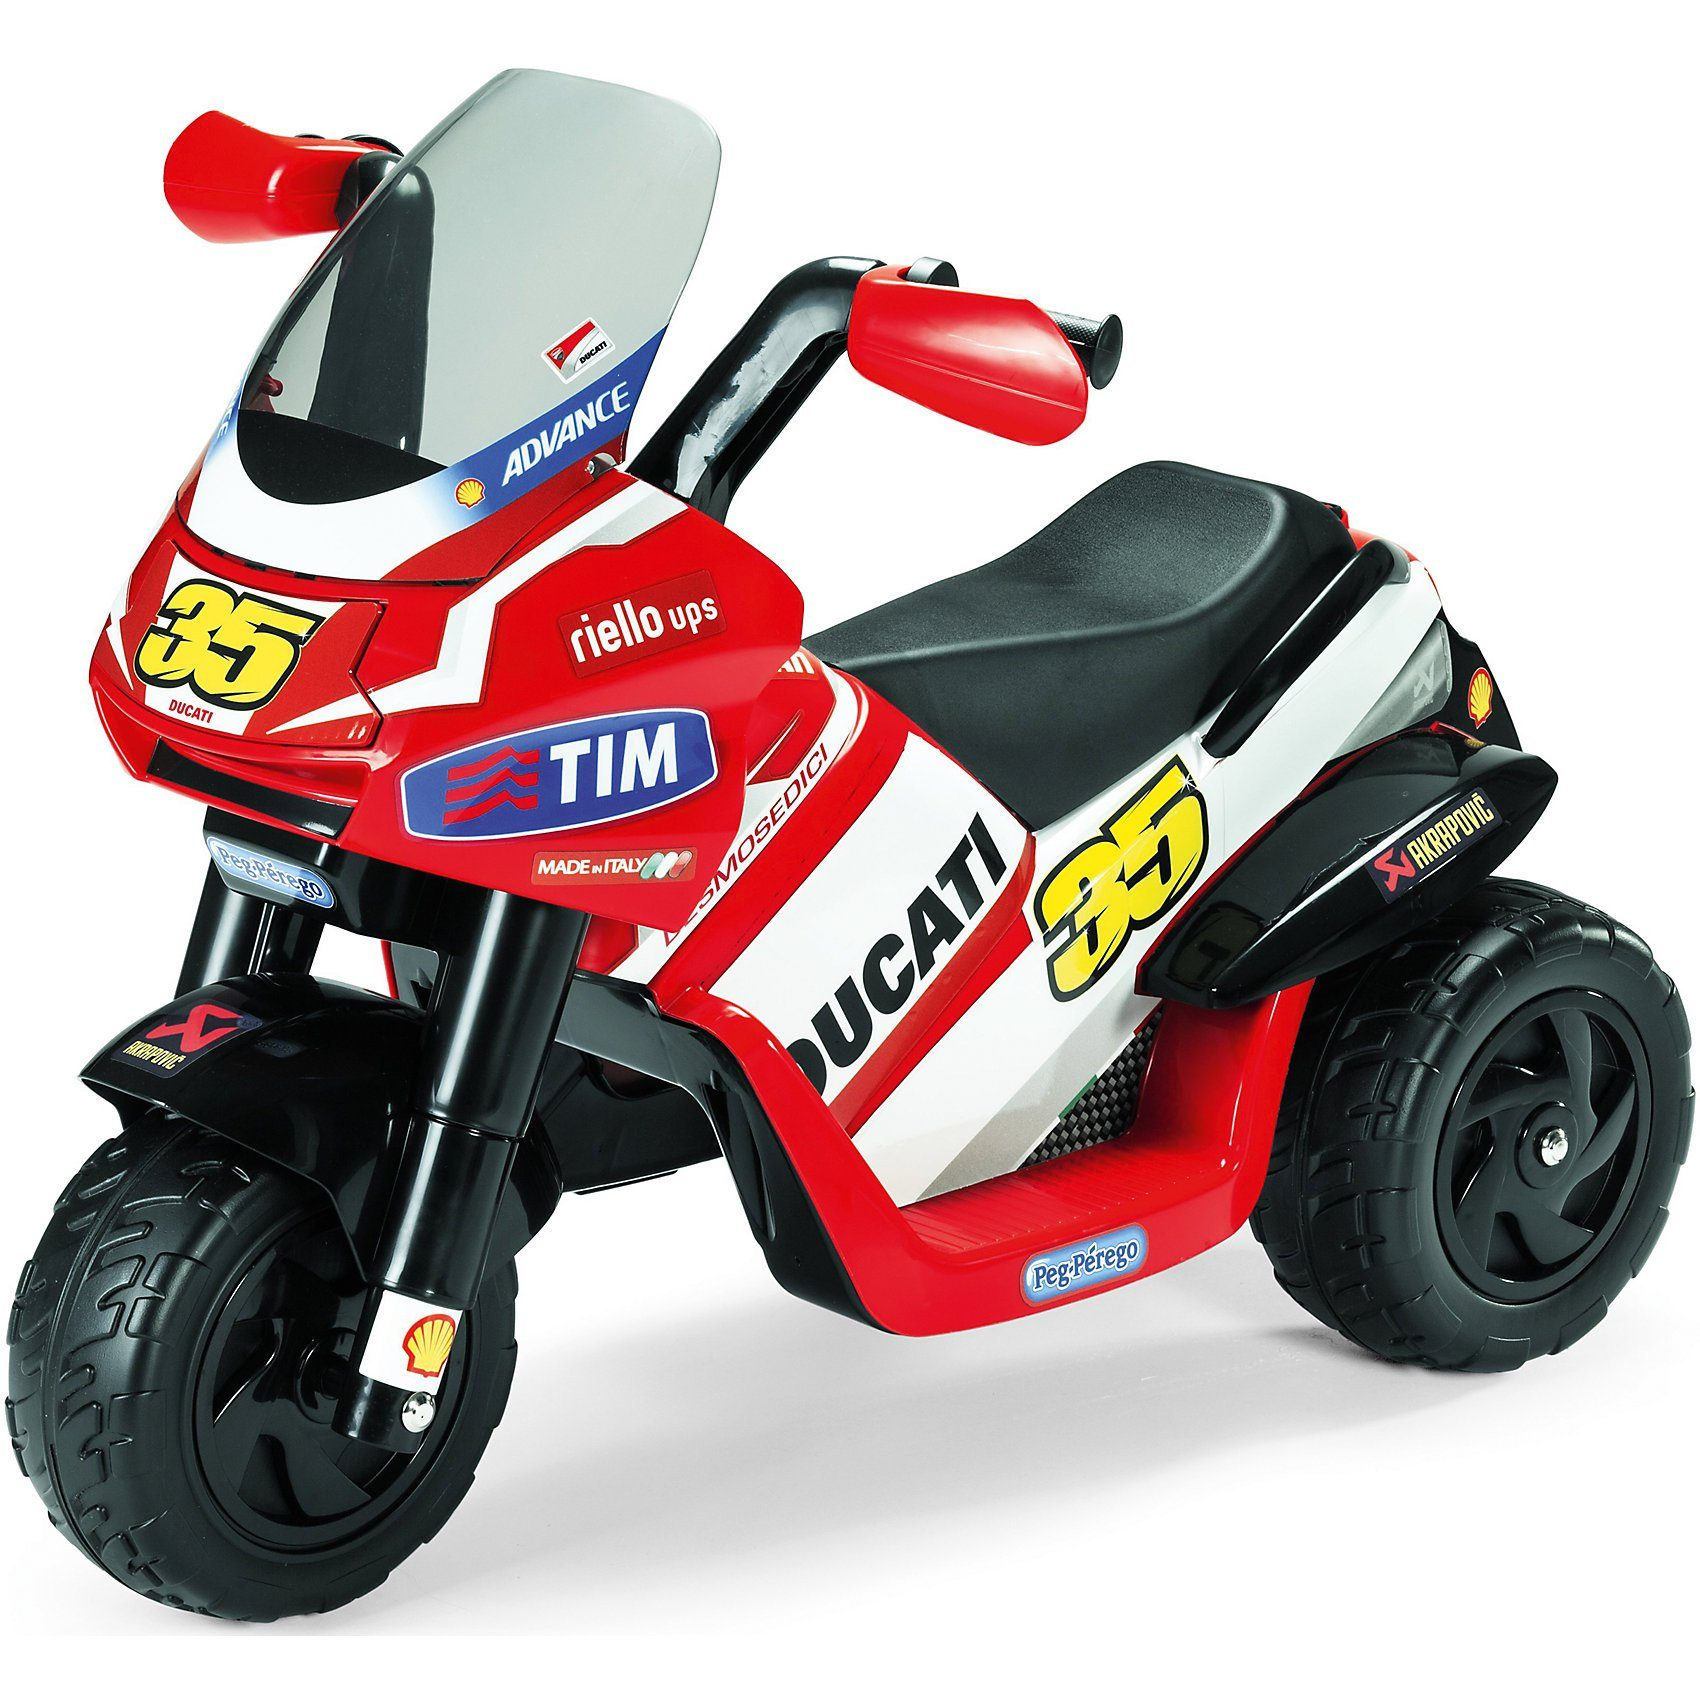 Peg Perego Elektrofahrzeug Ducati Desmosedici 6V